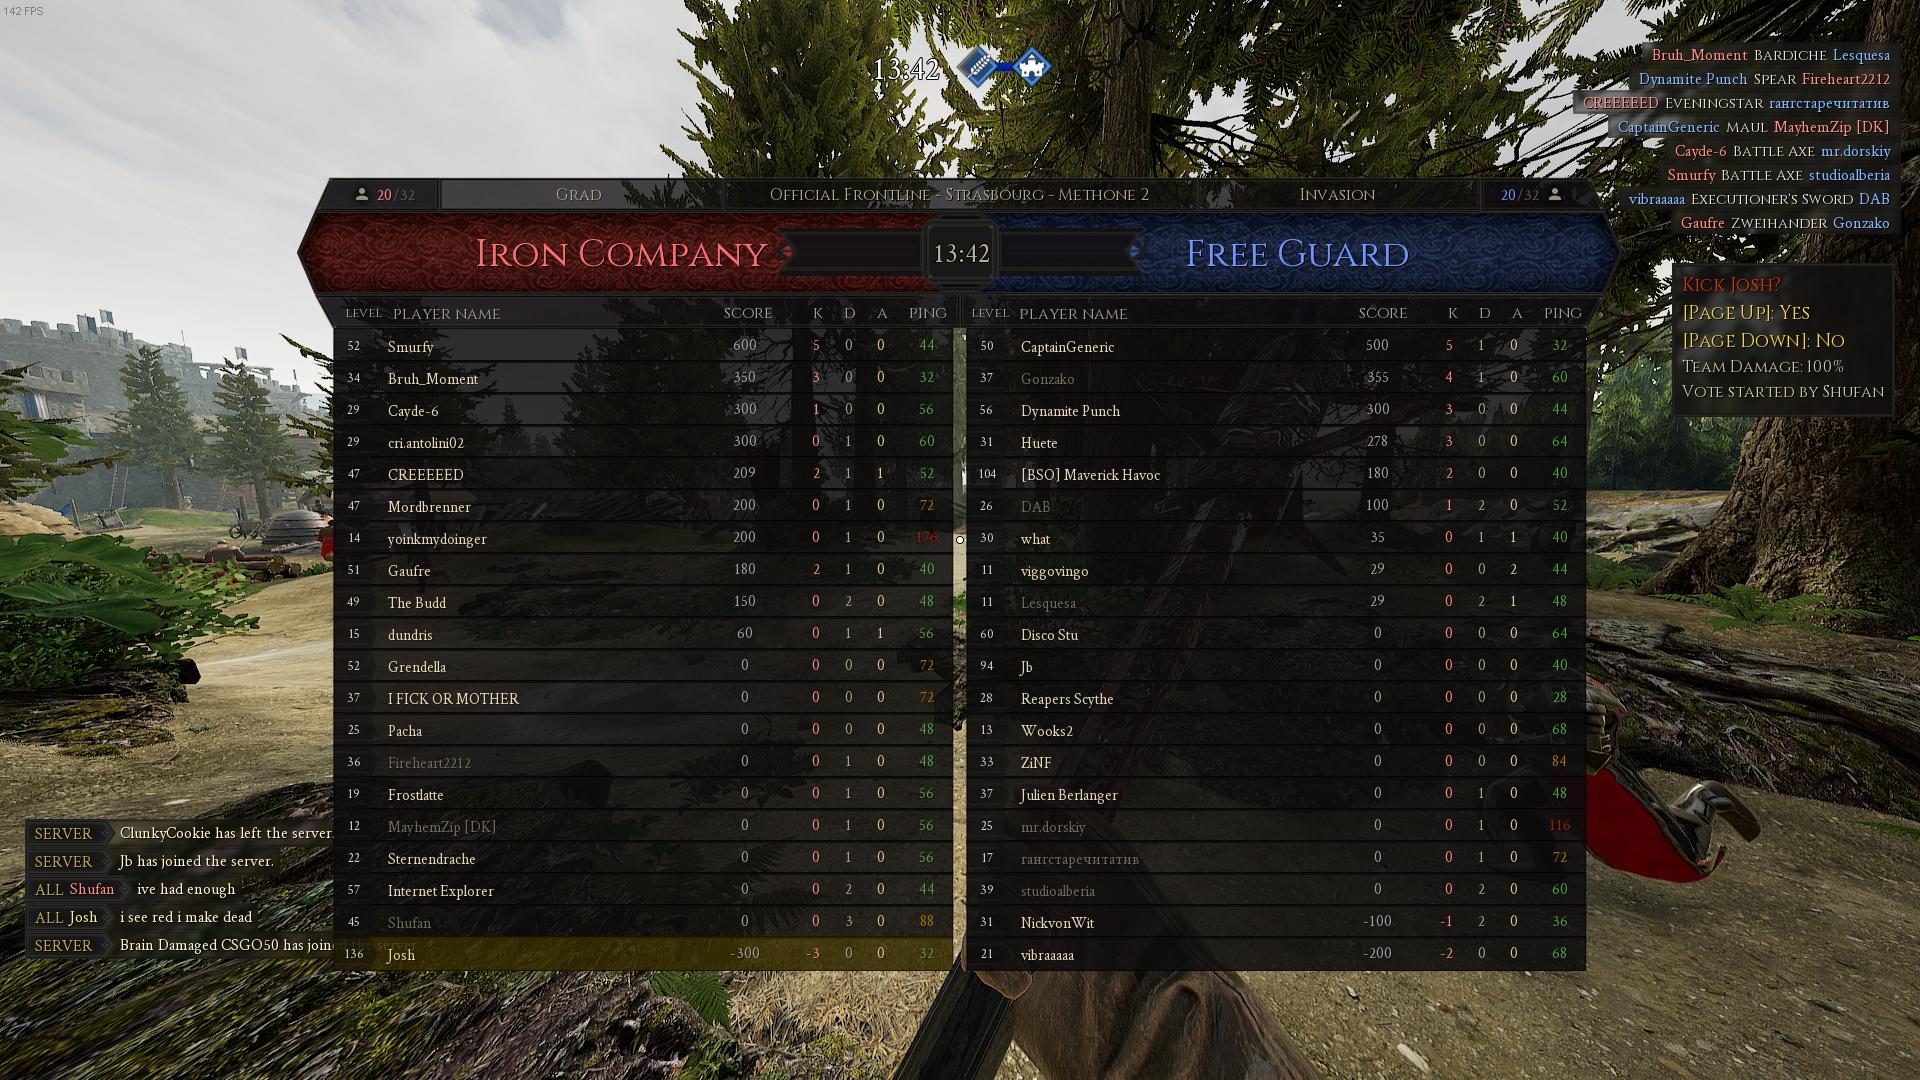 team damage vote 2.png